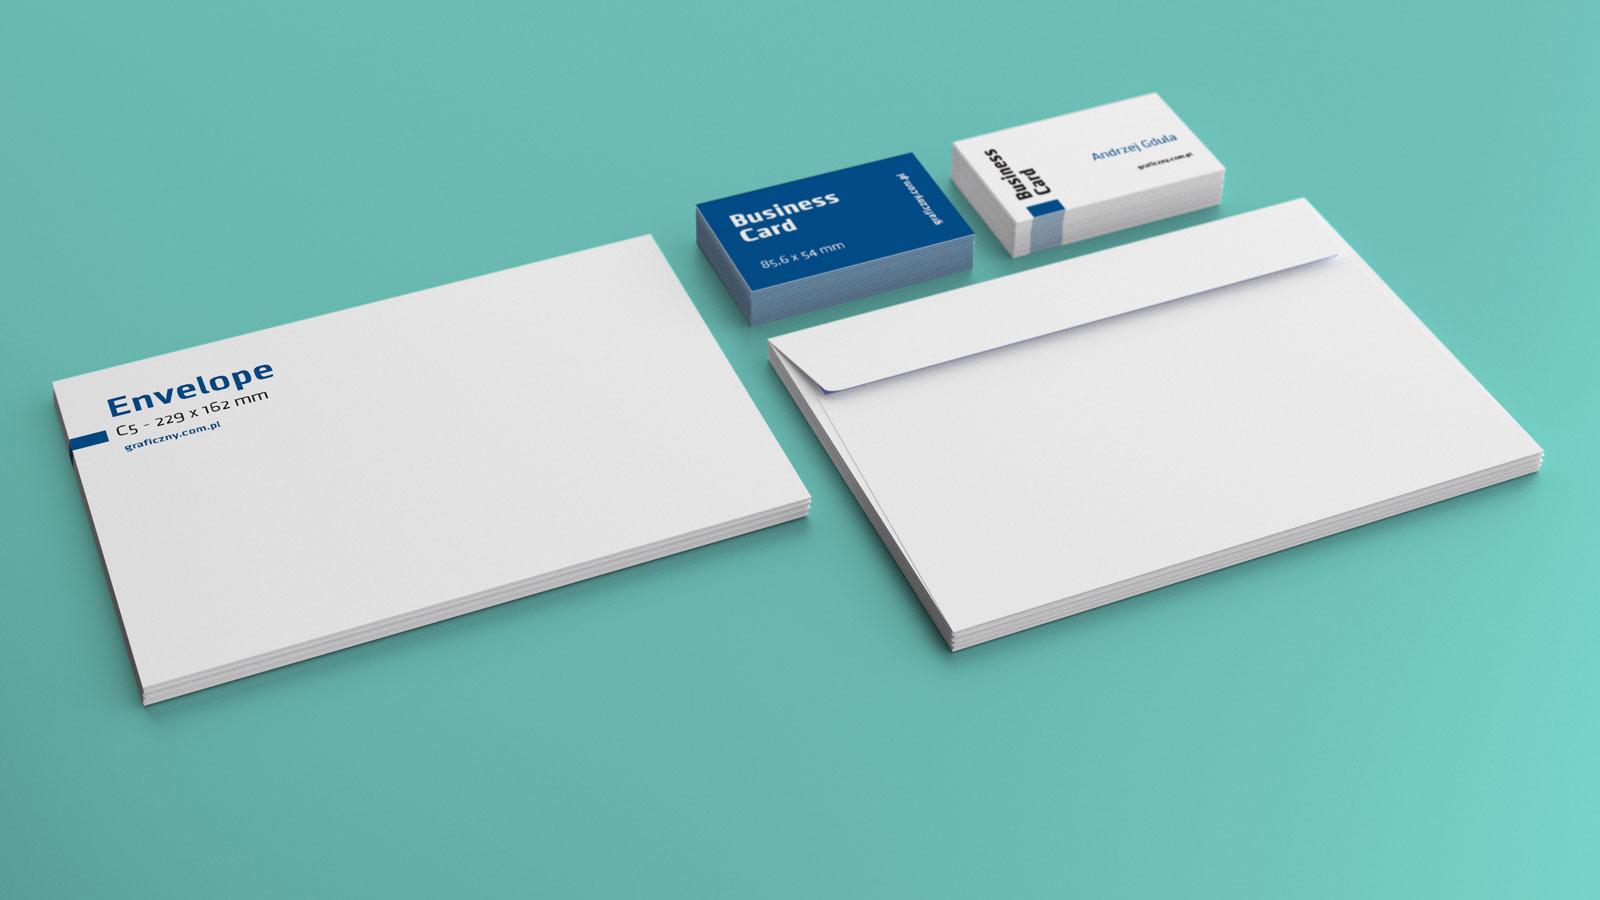 Free-Envelop-Business-Card-Mockup-PSD